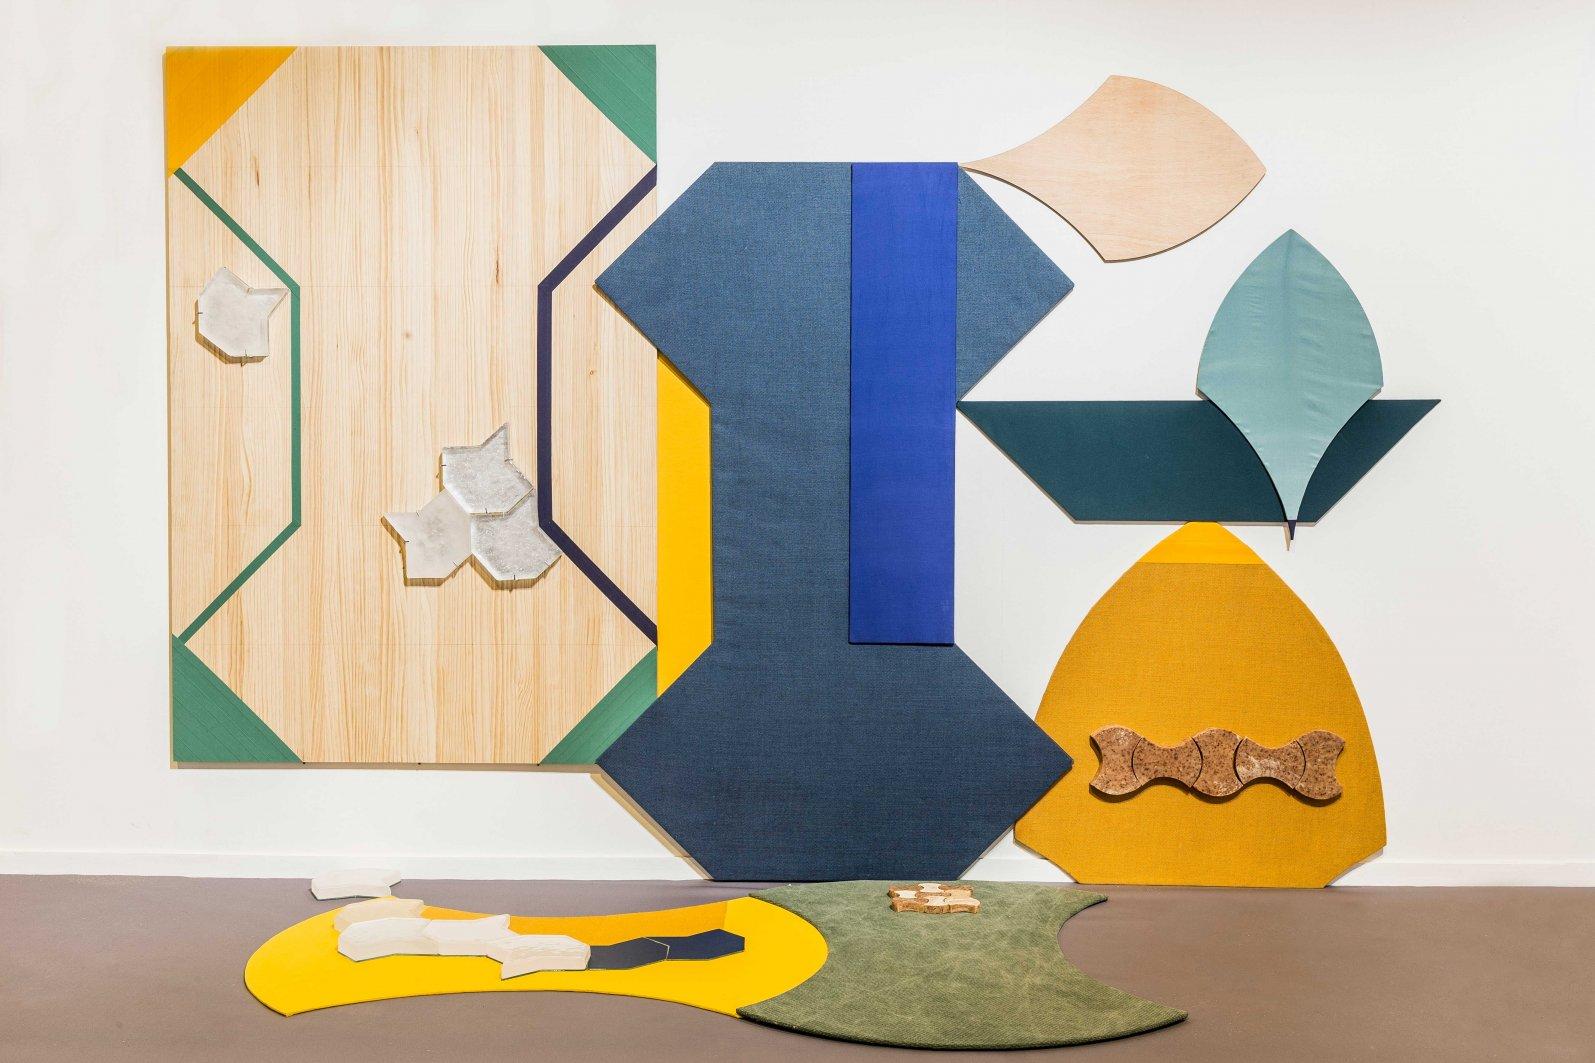 Pétalo, hueso, aguja, huso, madera, tela, jabón, vidrio, pintura (2016) - Miren Doiz